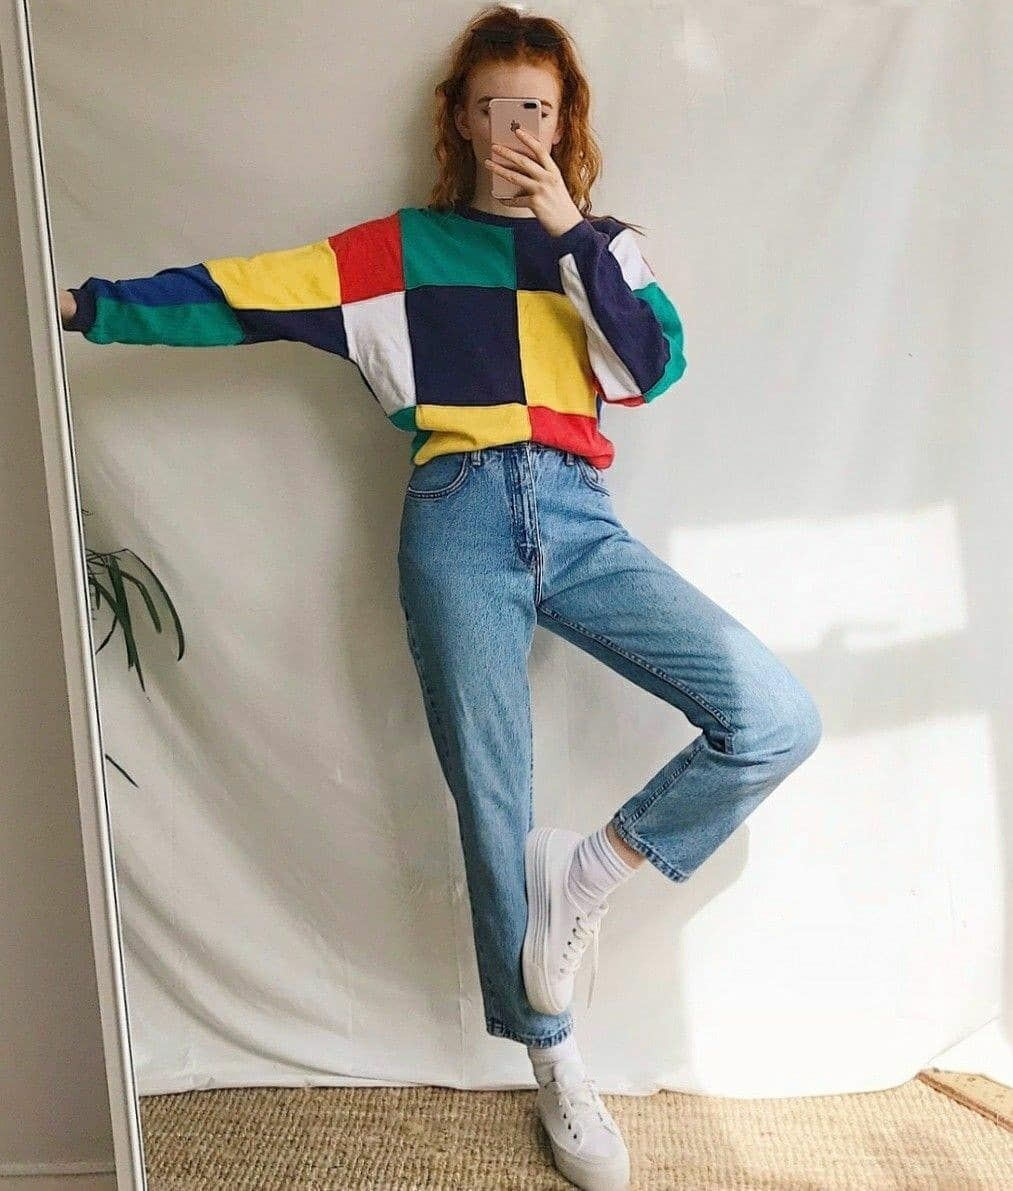 Bigfootpickles Indie Fashion Retro Outfits Retro Fashion